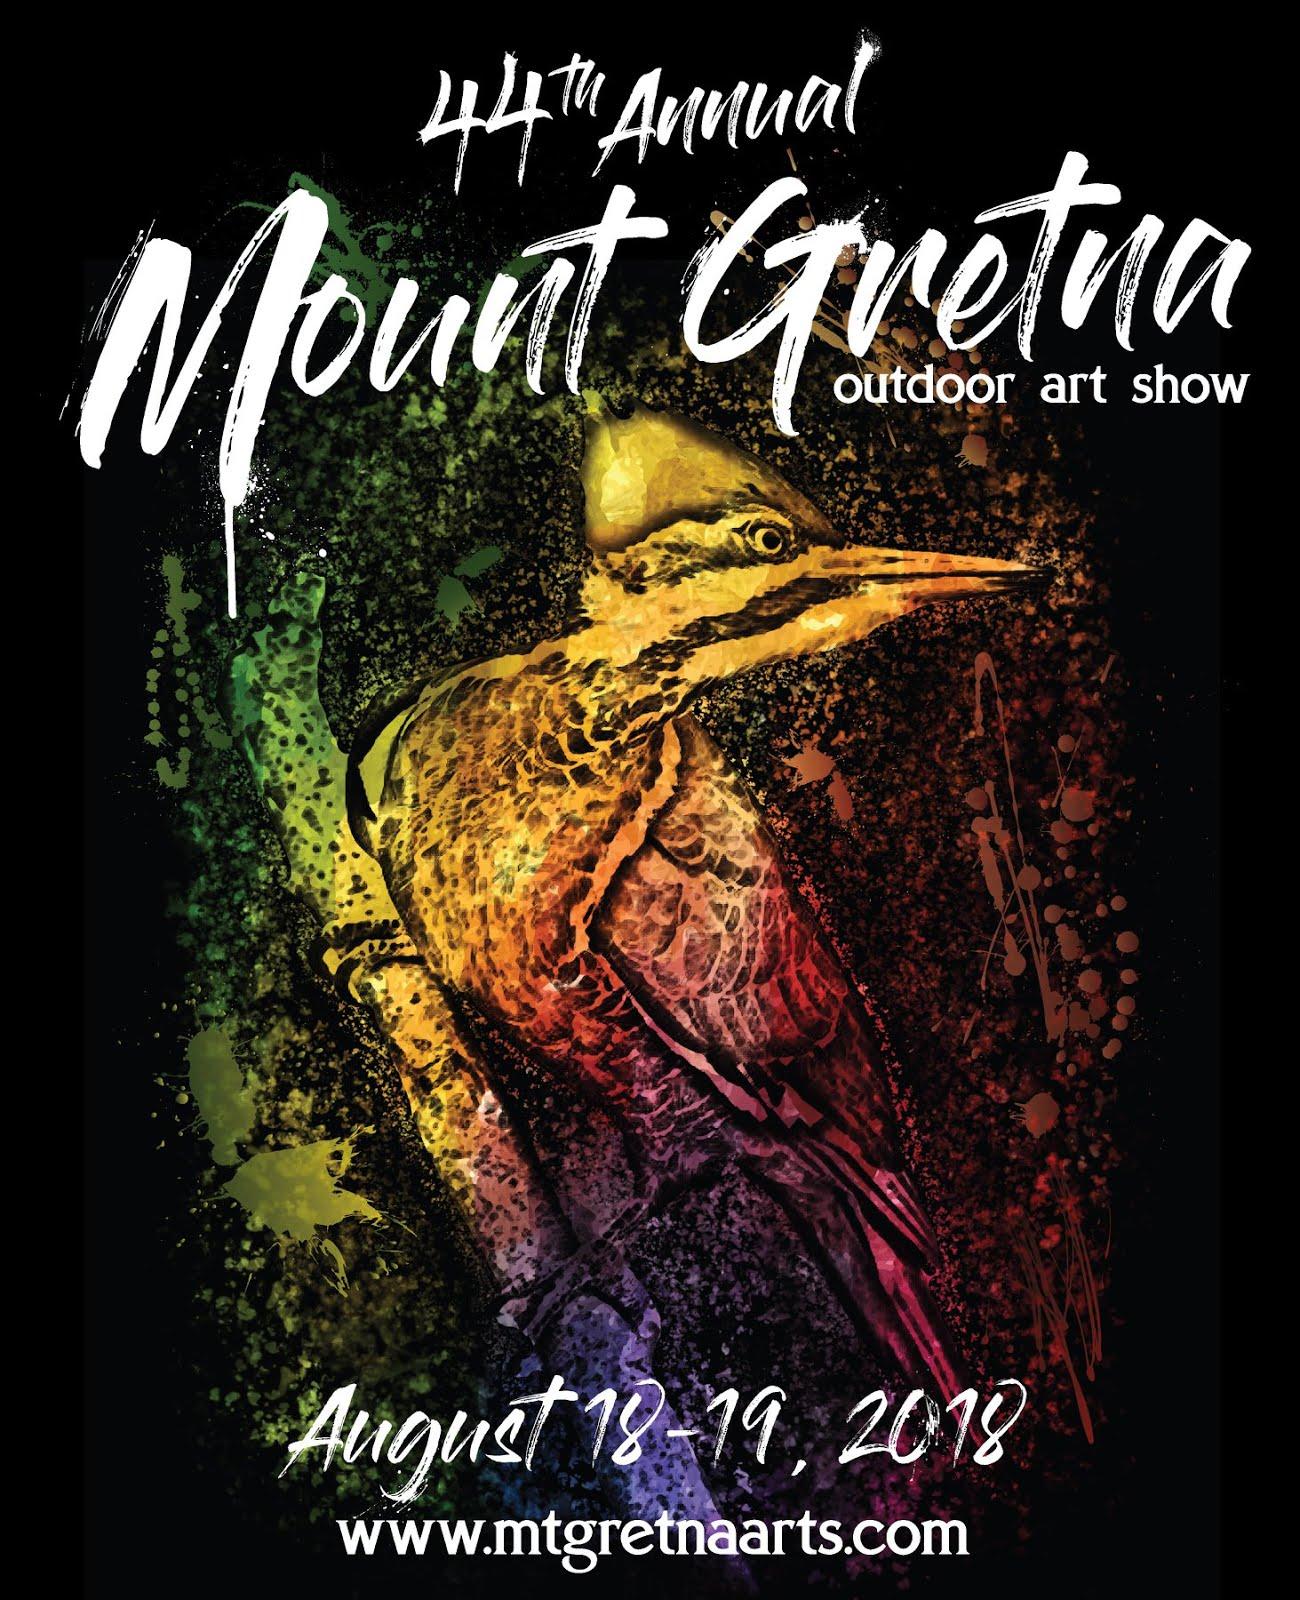 EXHIBITING ARTIST AT MT. GRETNA OUTDOOR ART SHOW 2018